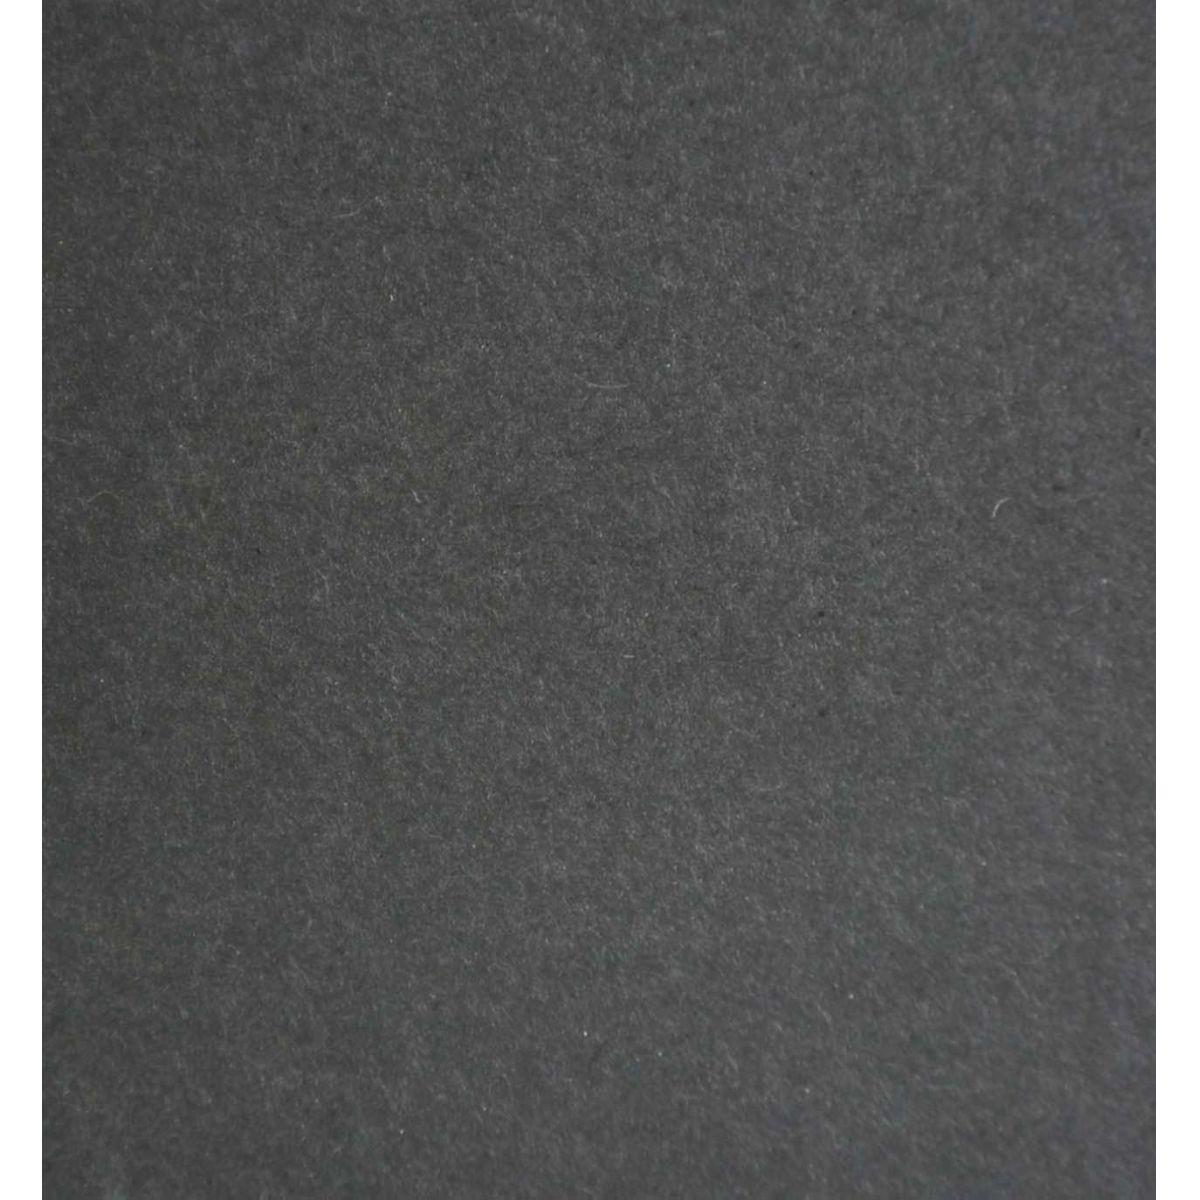 Papel PopSet Black - 400g